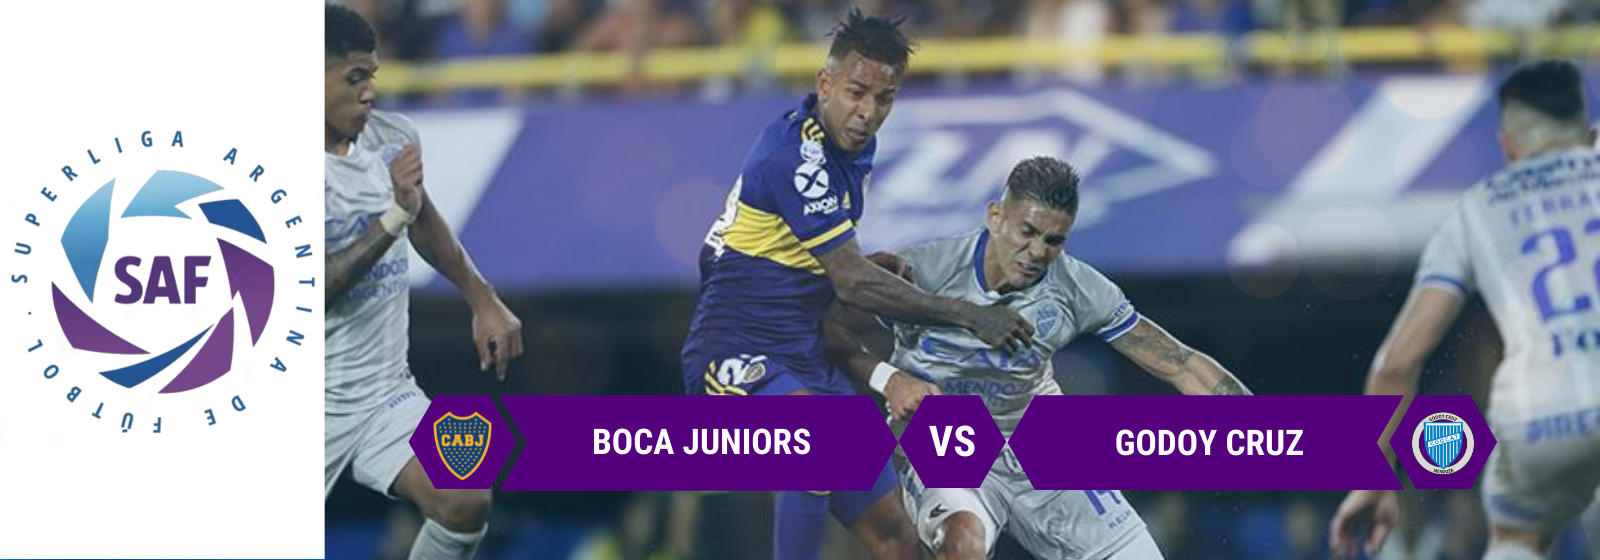 Asianconnect: Boca vs Godoy Cruz Odds for February 23, 2020